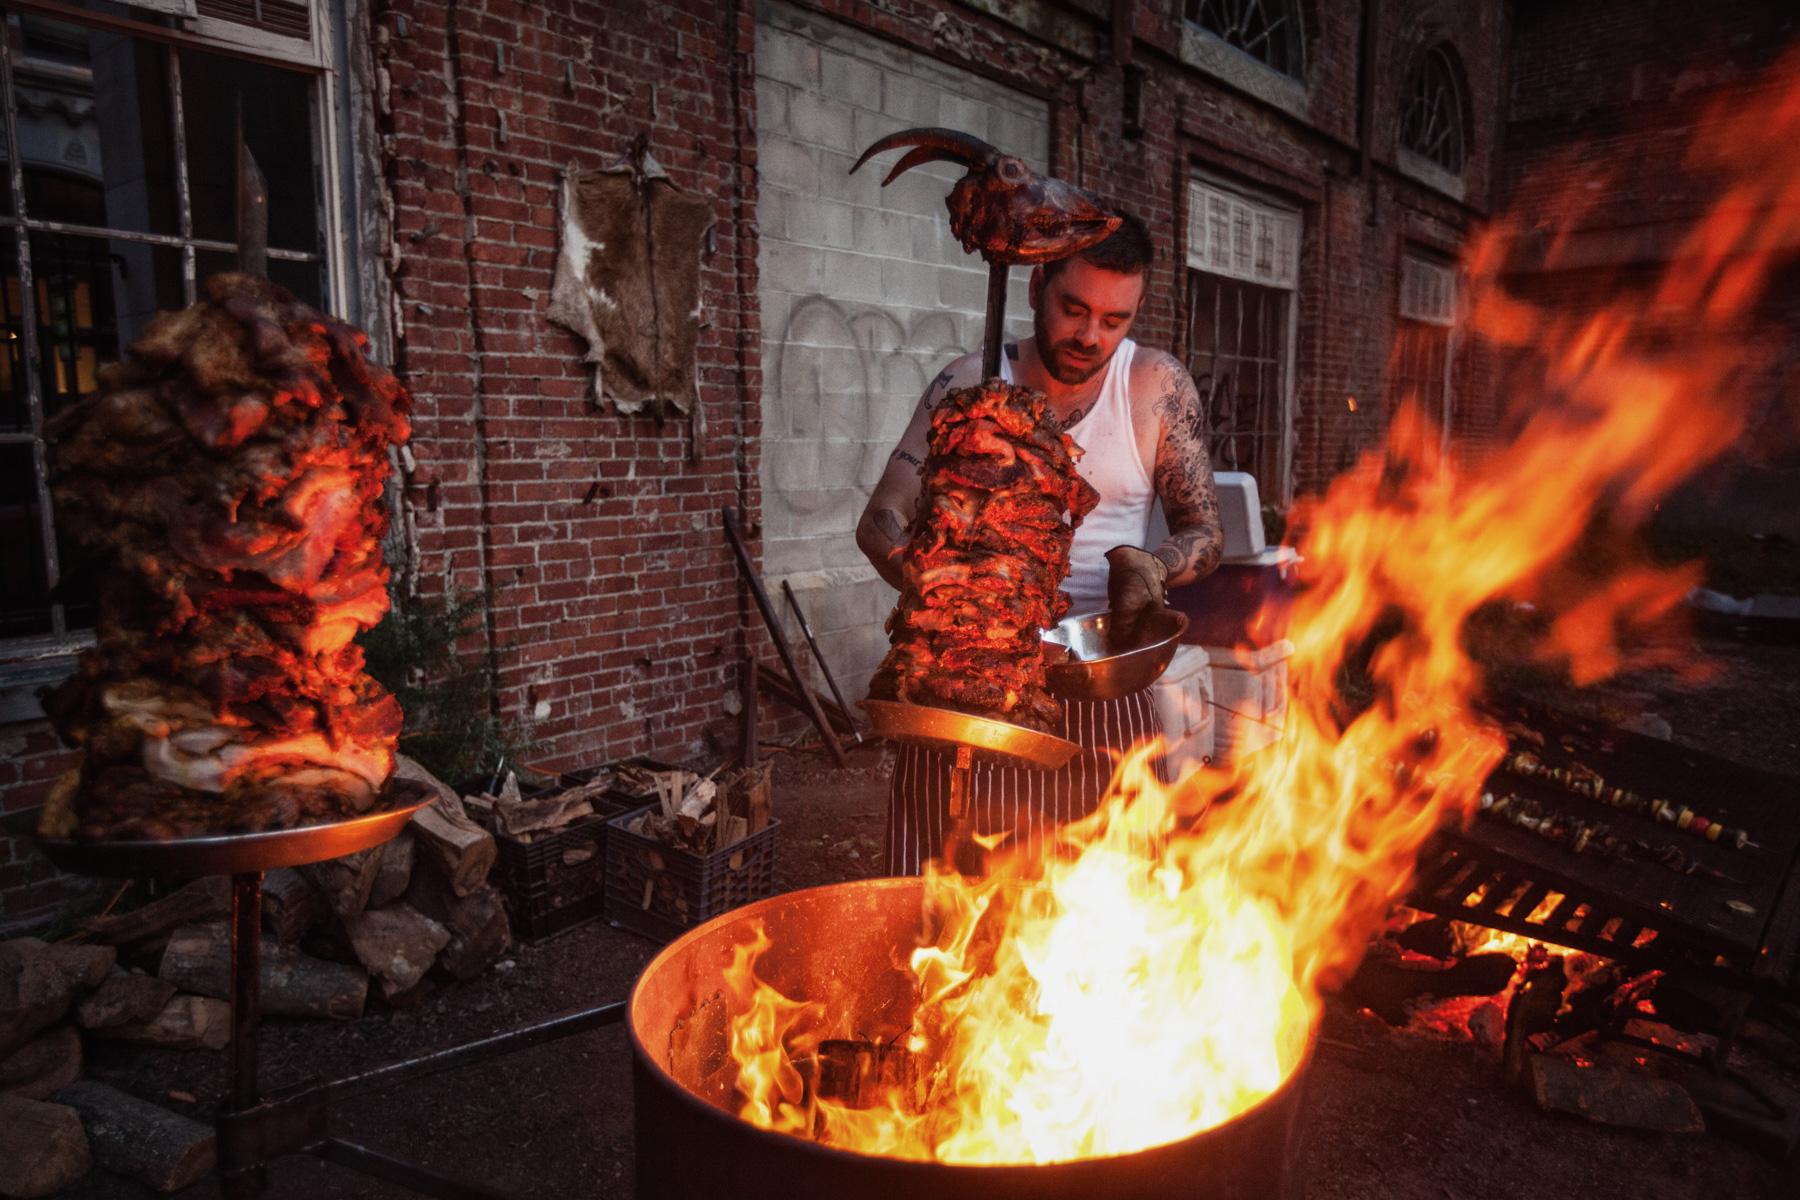 apocolypse-fire-cooking-1.jpg